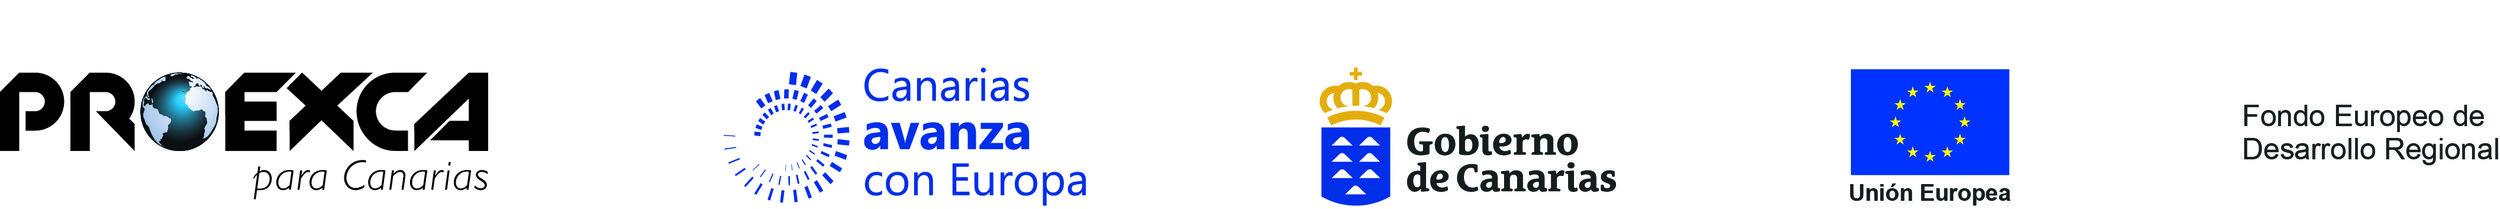 New Conjunto Logos Aporta.jpg